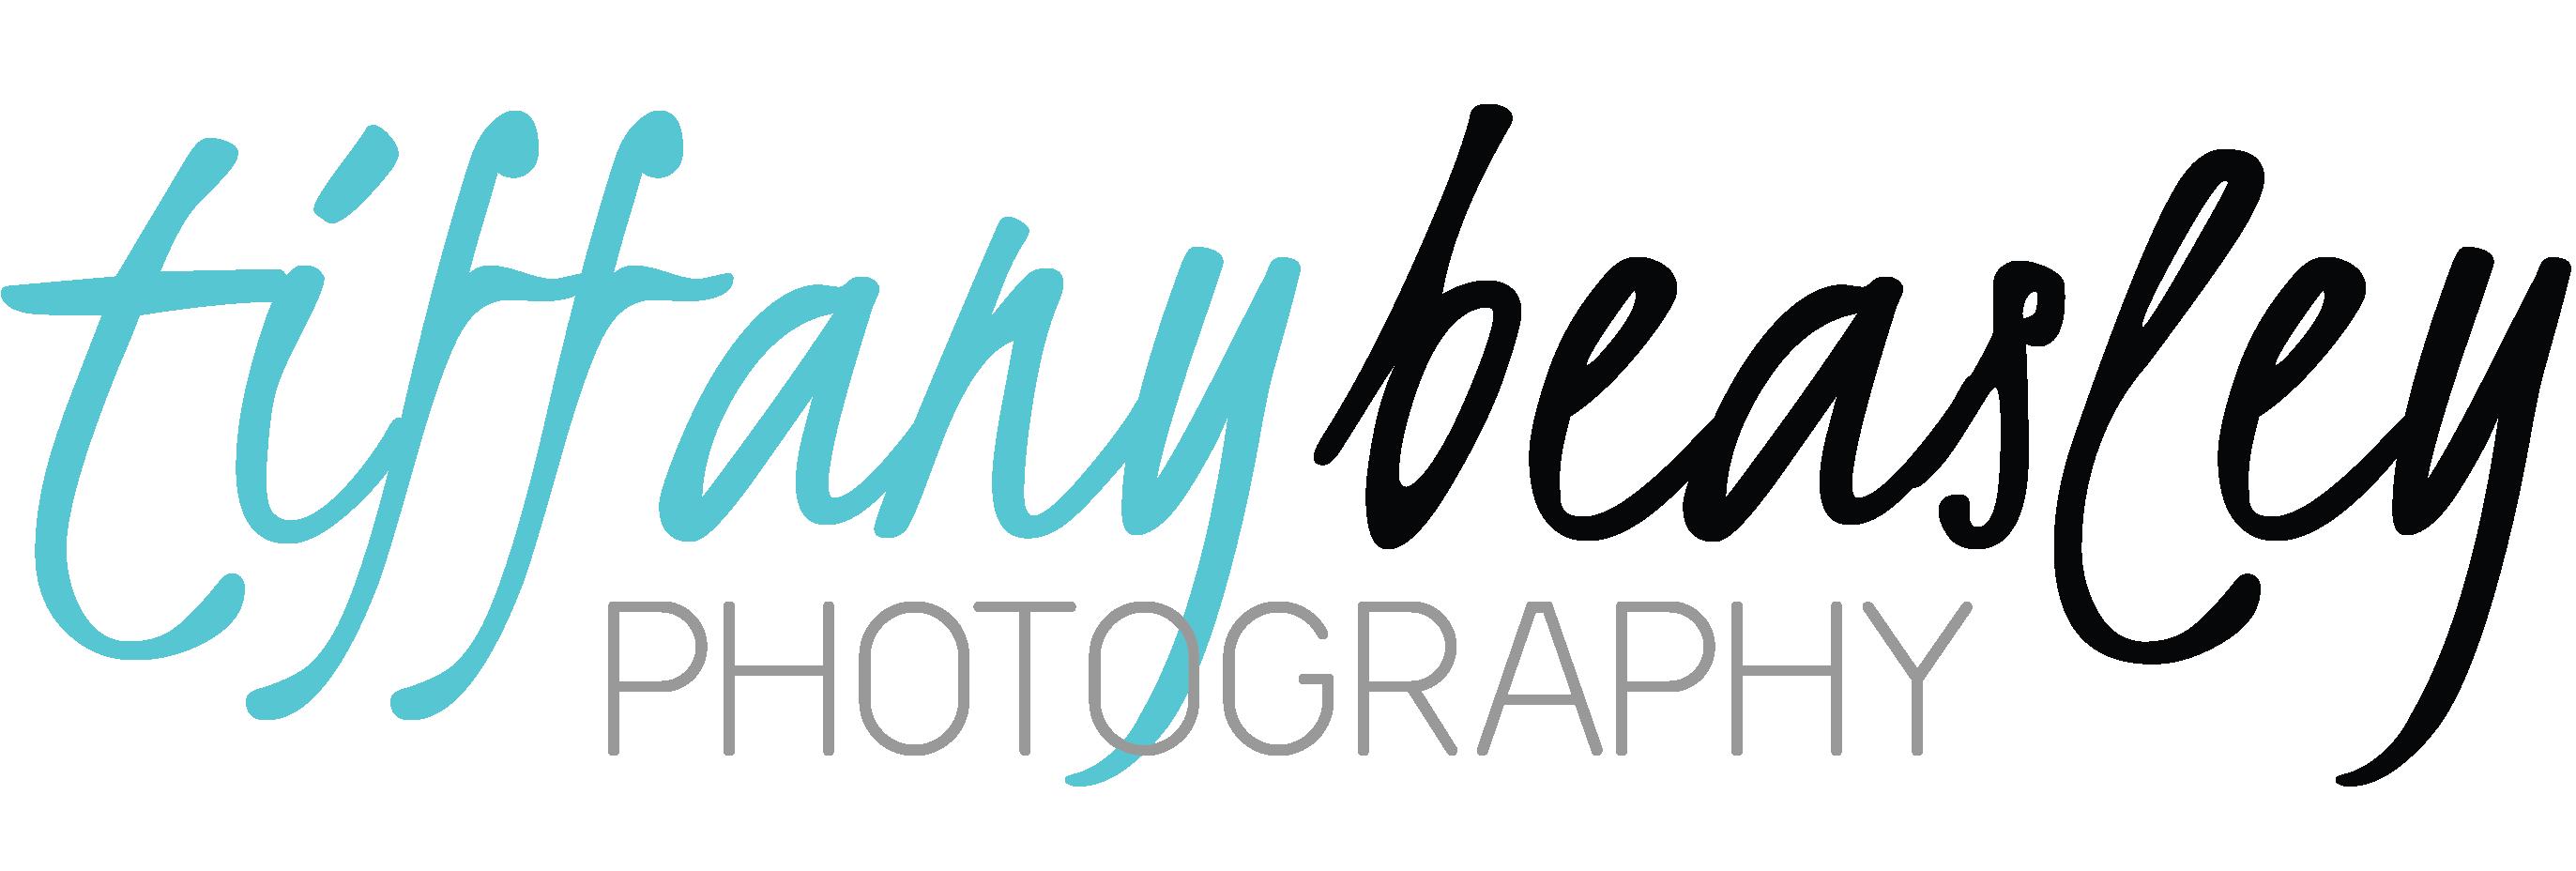 Tiffany Beasley Photography